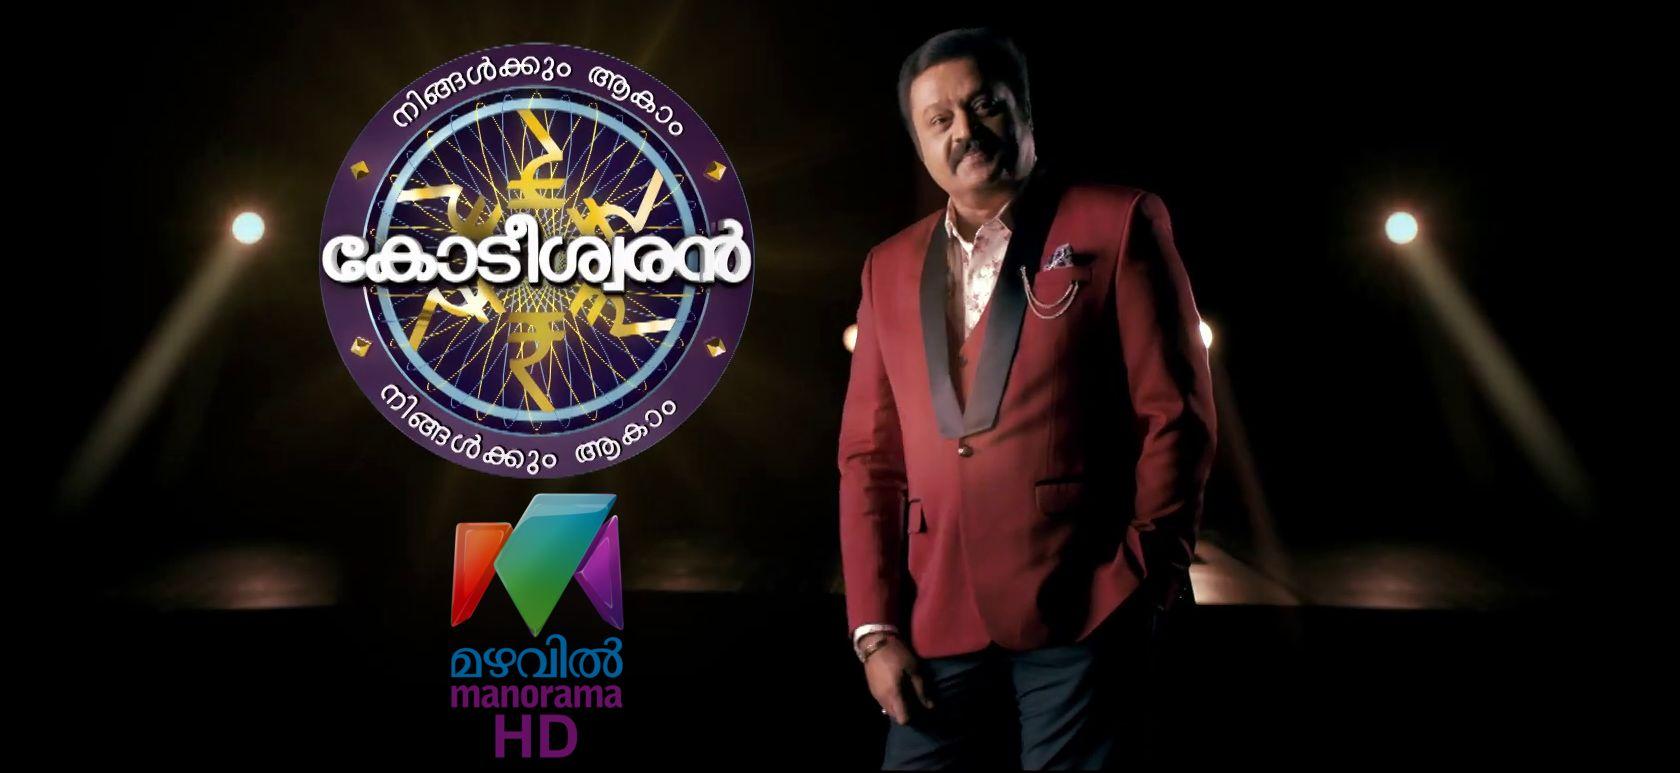 questions of malayalam kodeeswaran